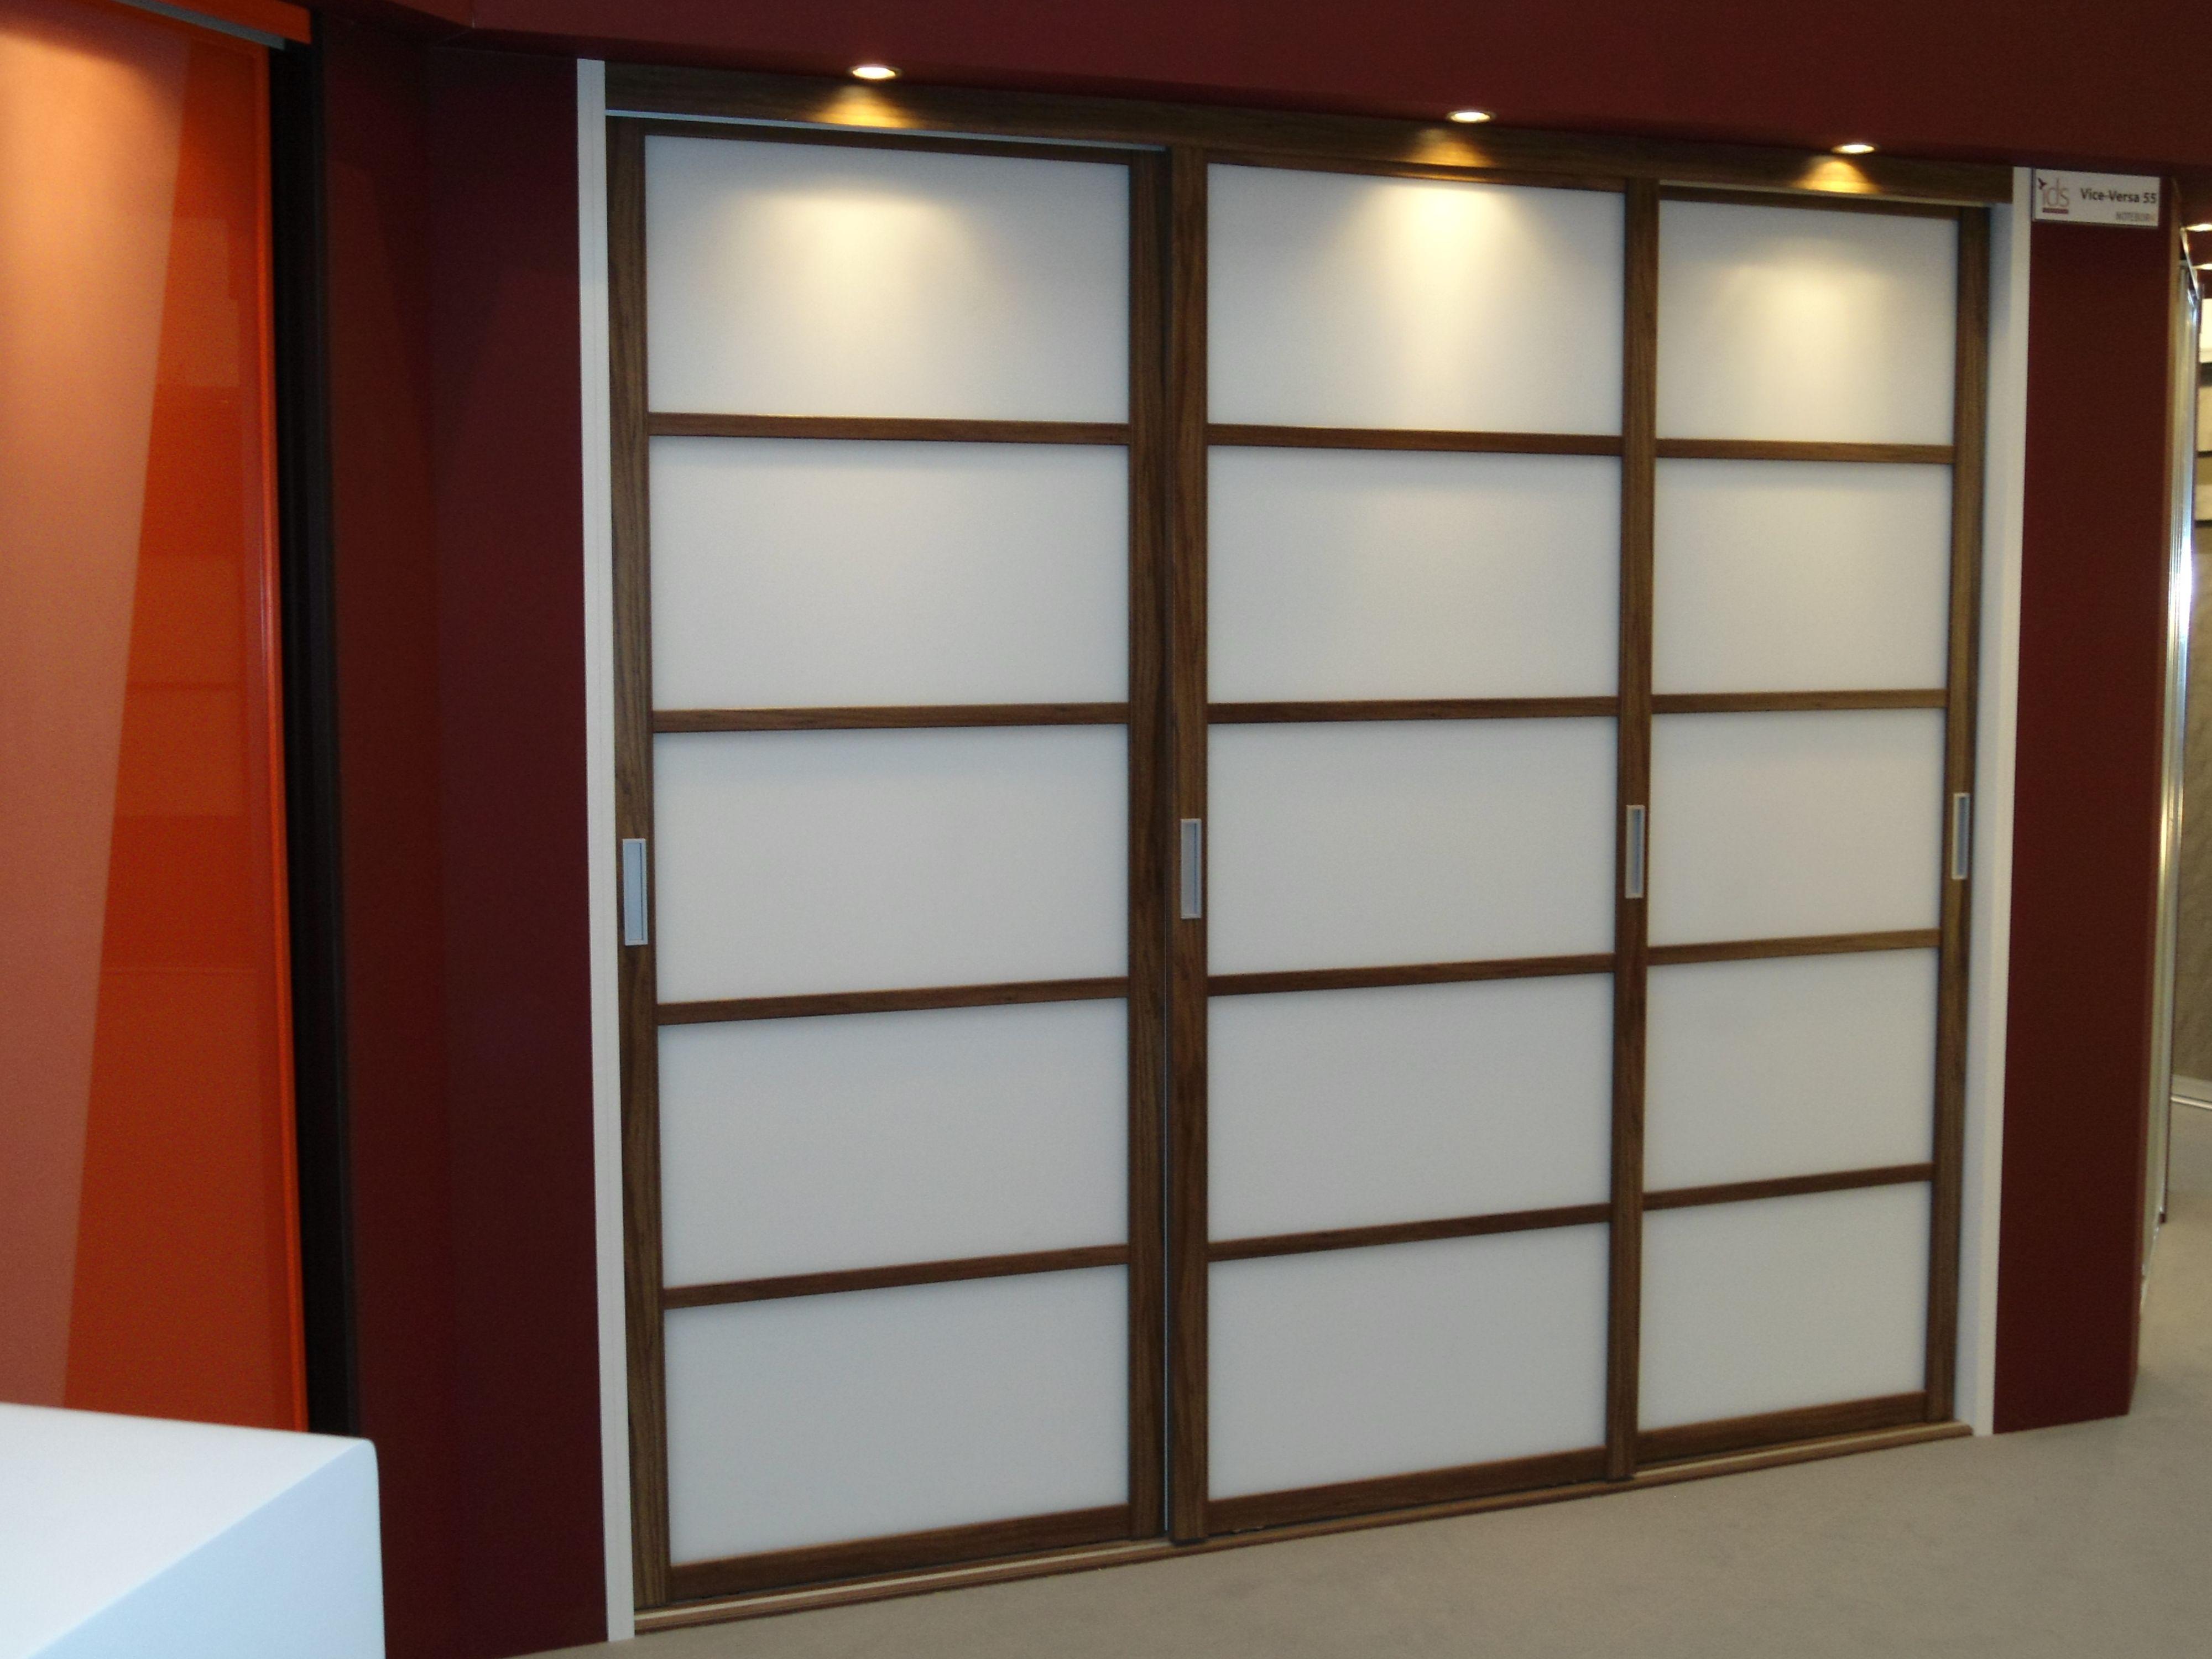 Japanese style sliding bedroom doors | Home and garden | Pinterest ...